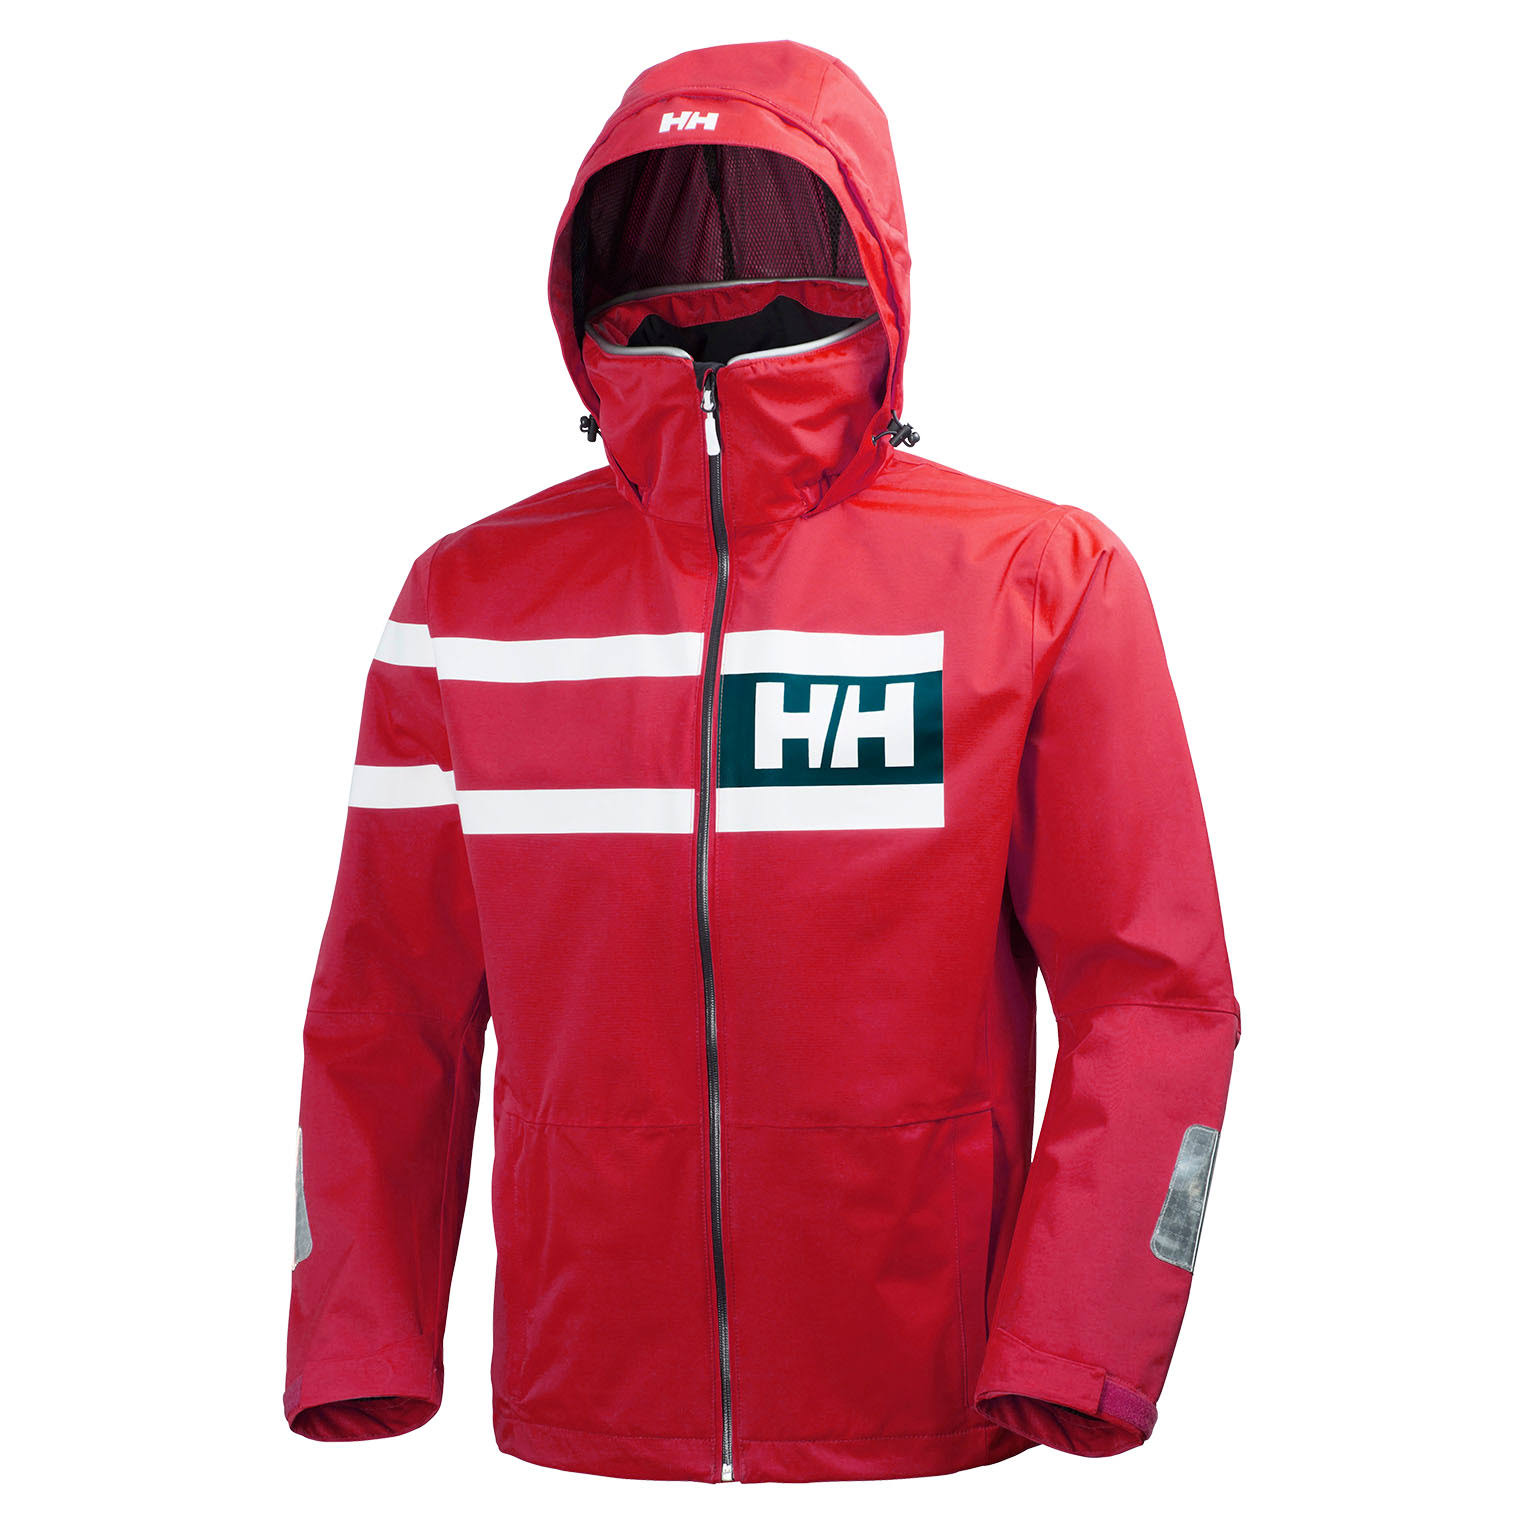 Helly Power Hansen Chaqueta Roja Salt M f6rOqf48w